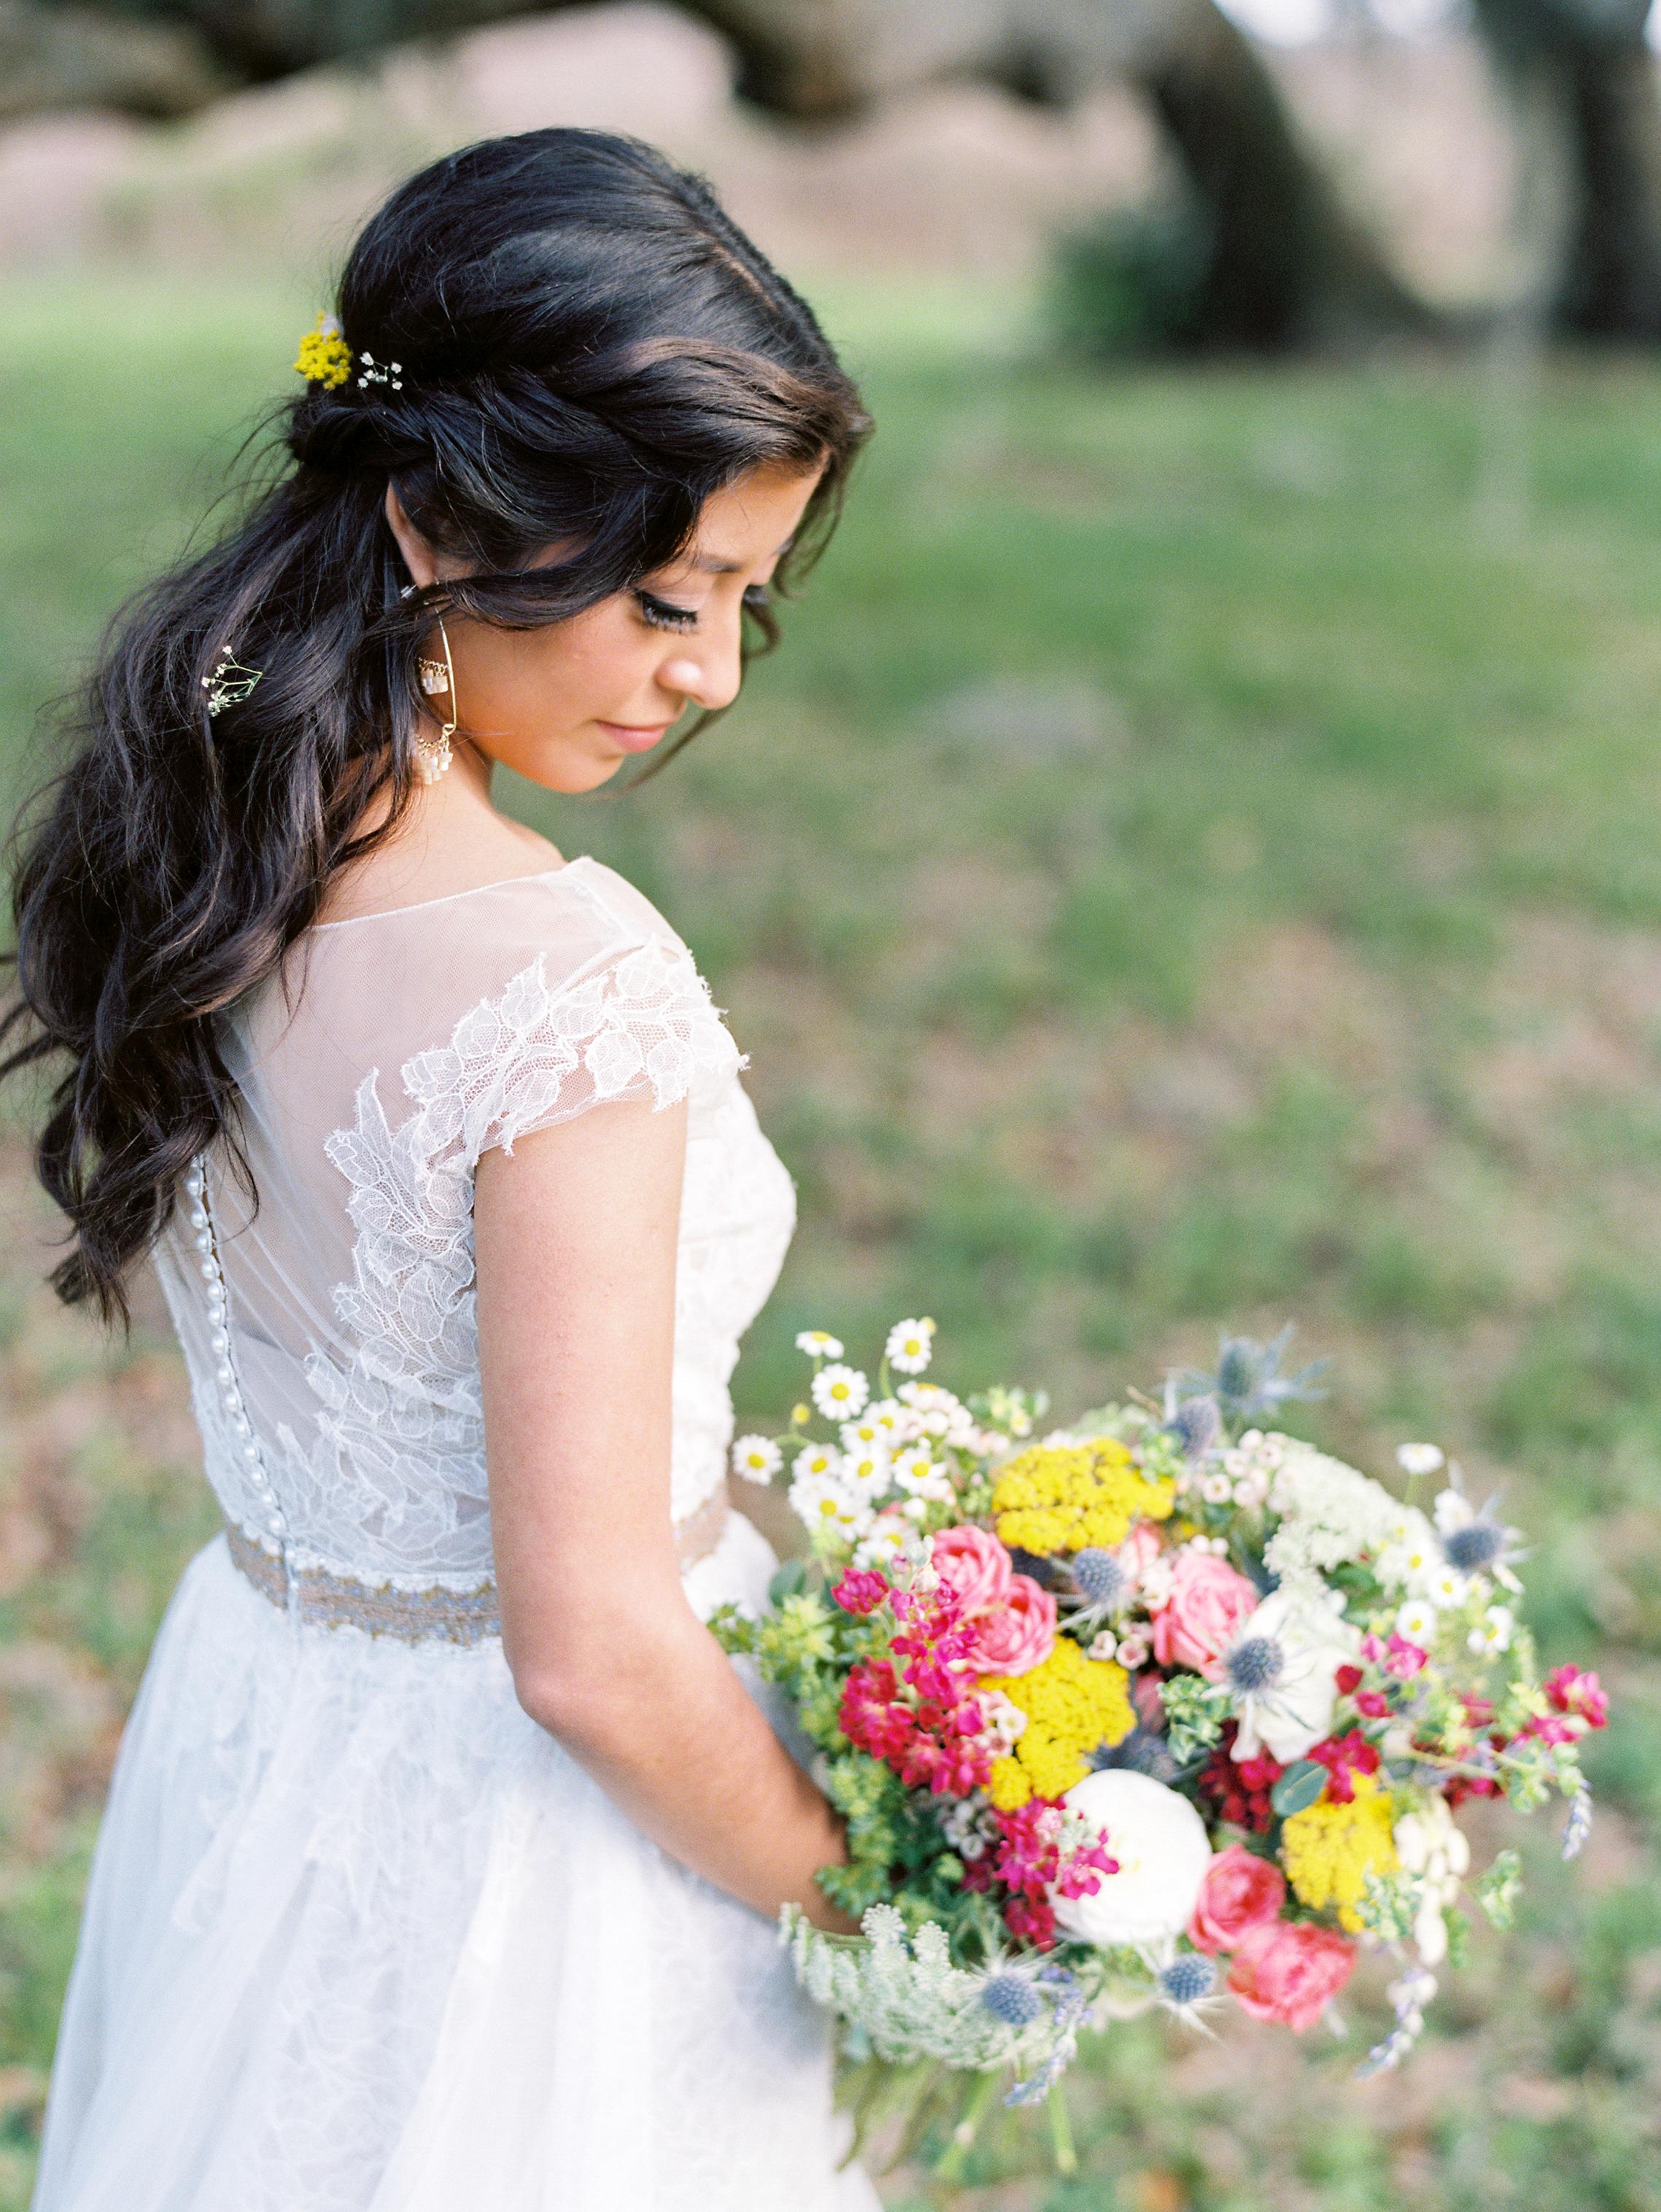 Dana Fernandez Photography Houston Film Wedding Photographer Destination Texas-12.jpg